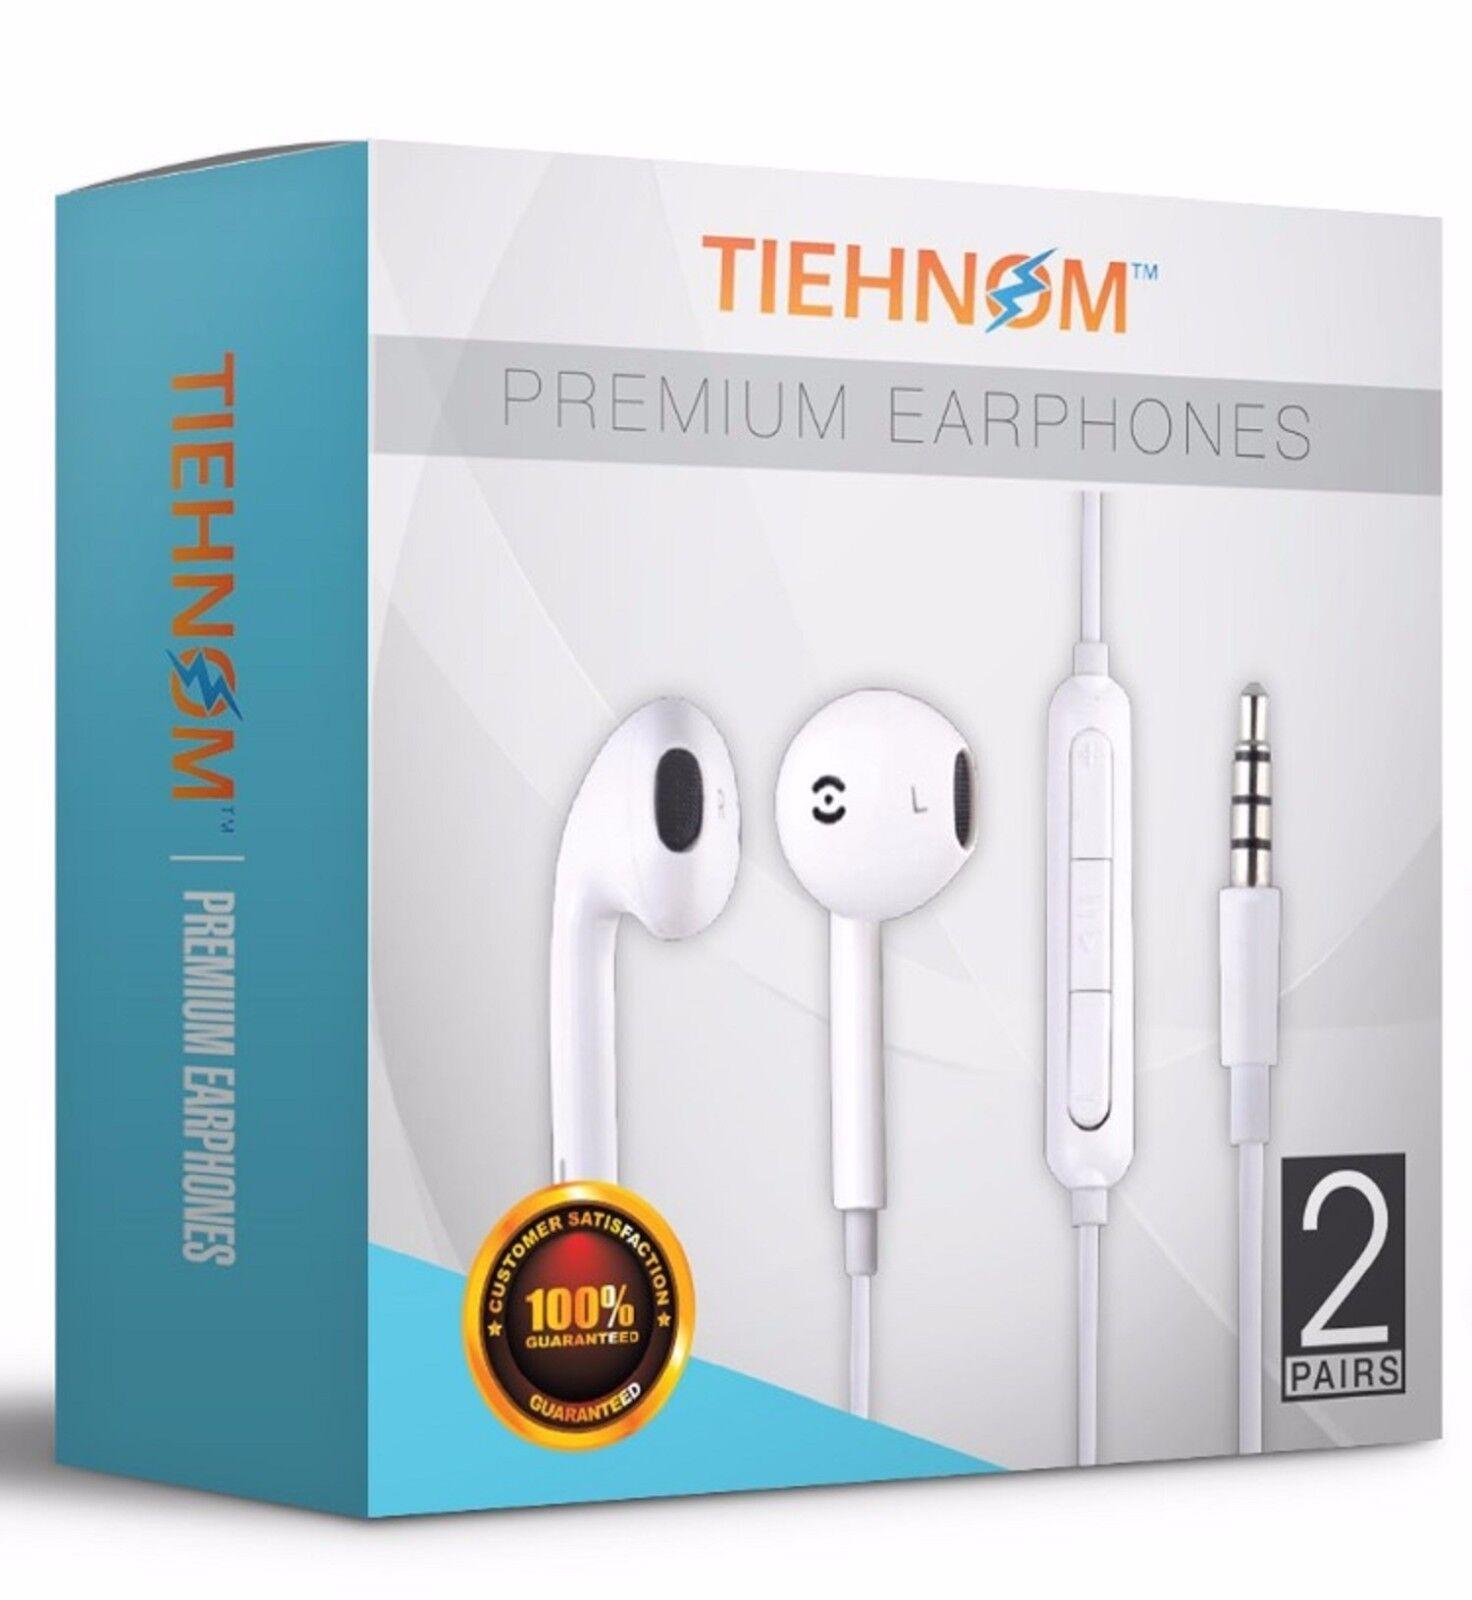 2-Pack Earbuds Headphones Headset Earphones with mic And Vol